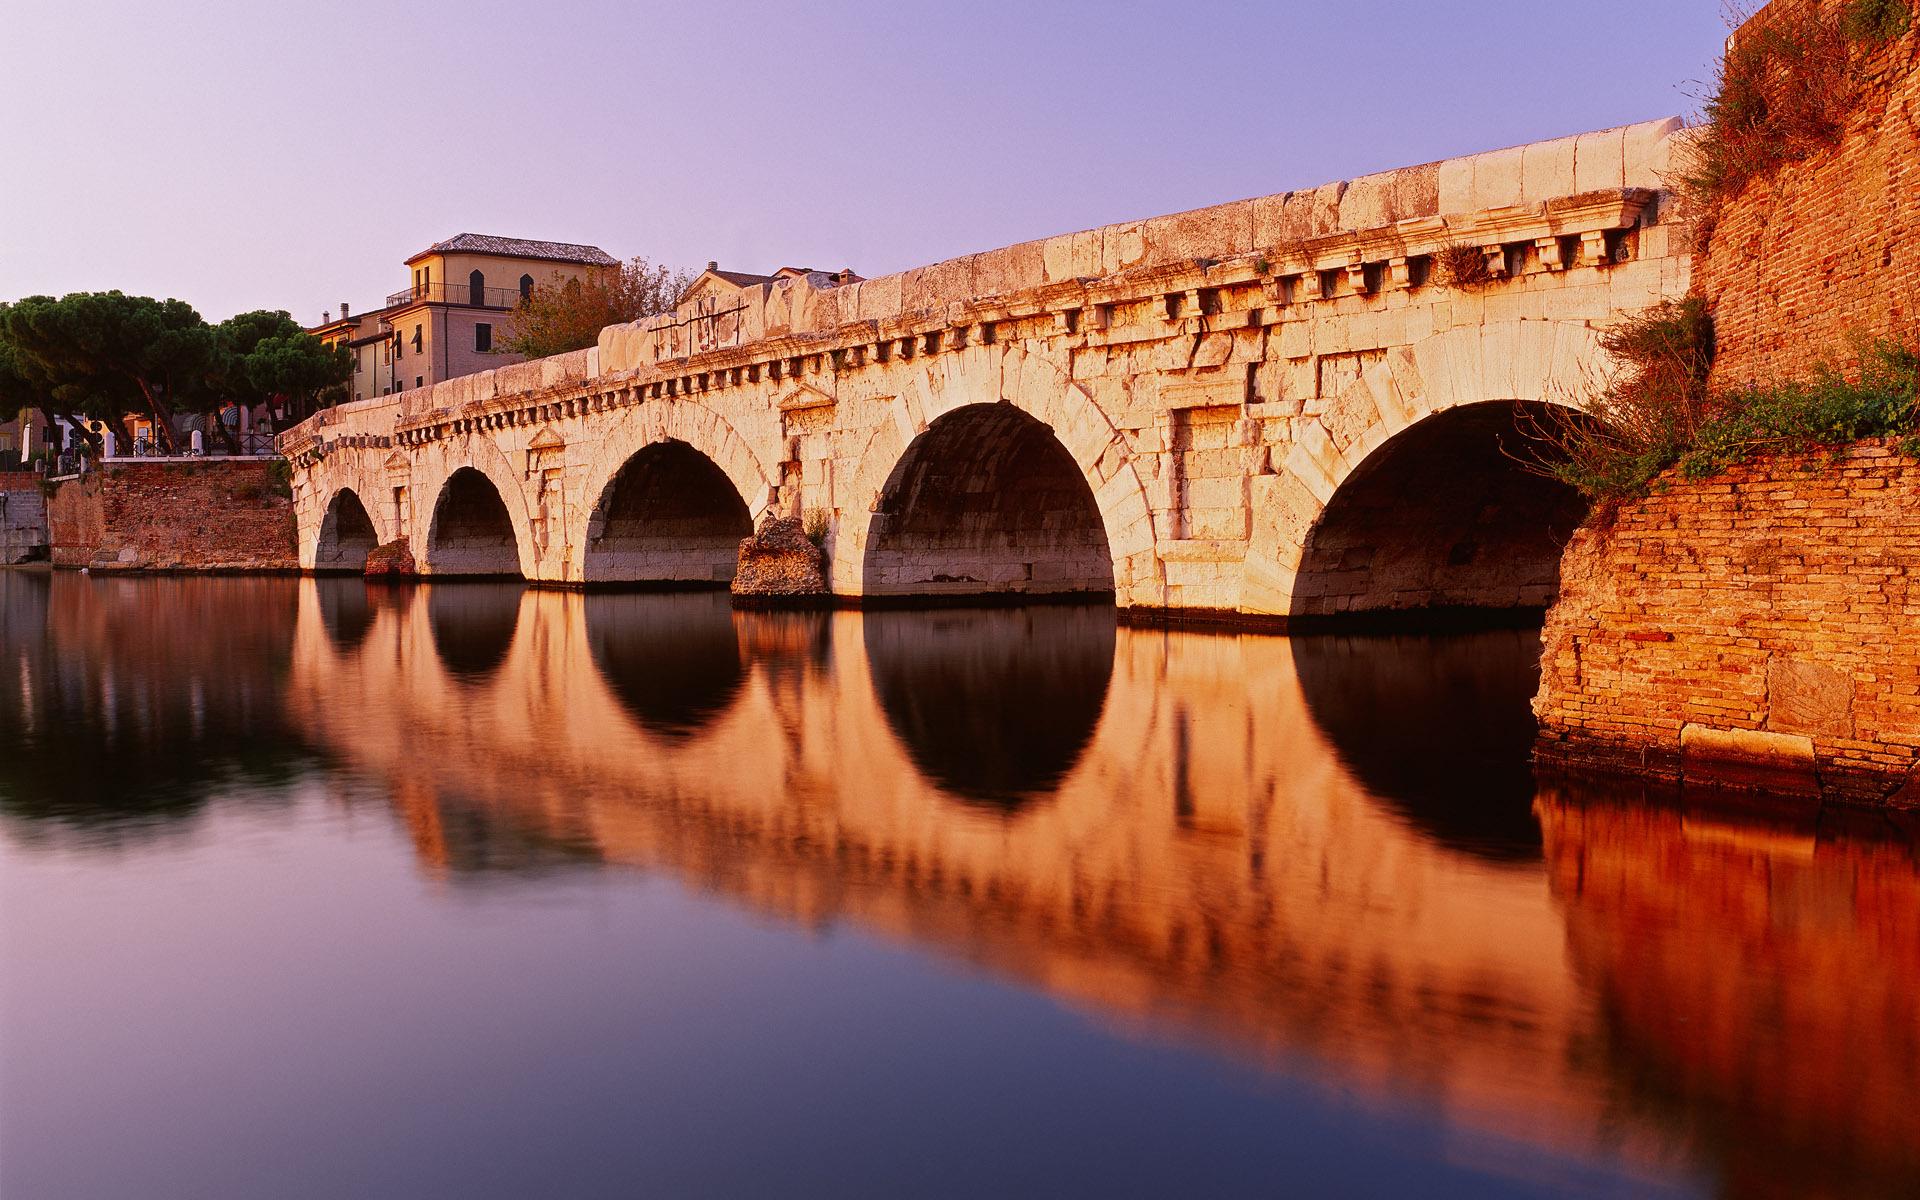 Город мост через реку  № 3713165 бесплатно